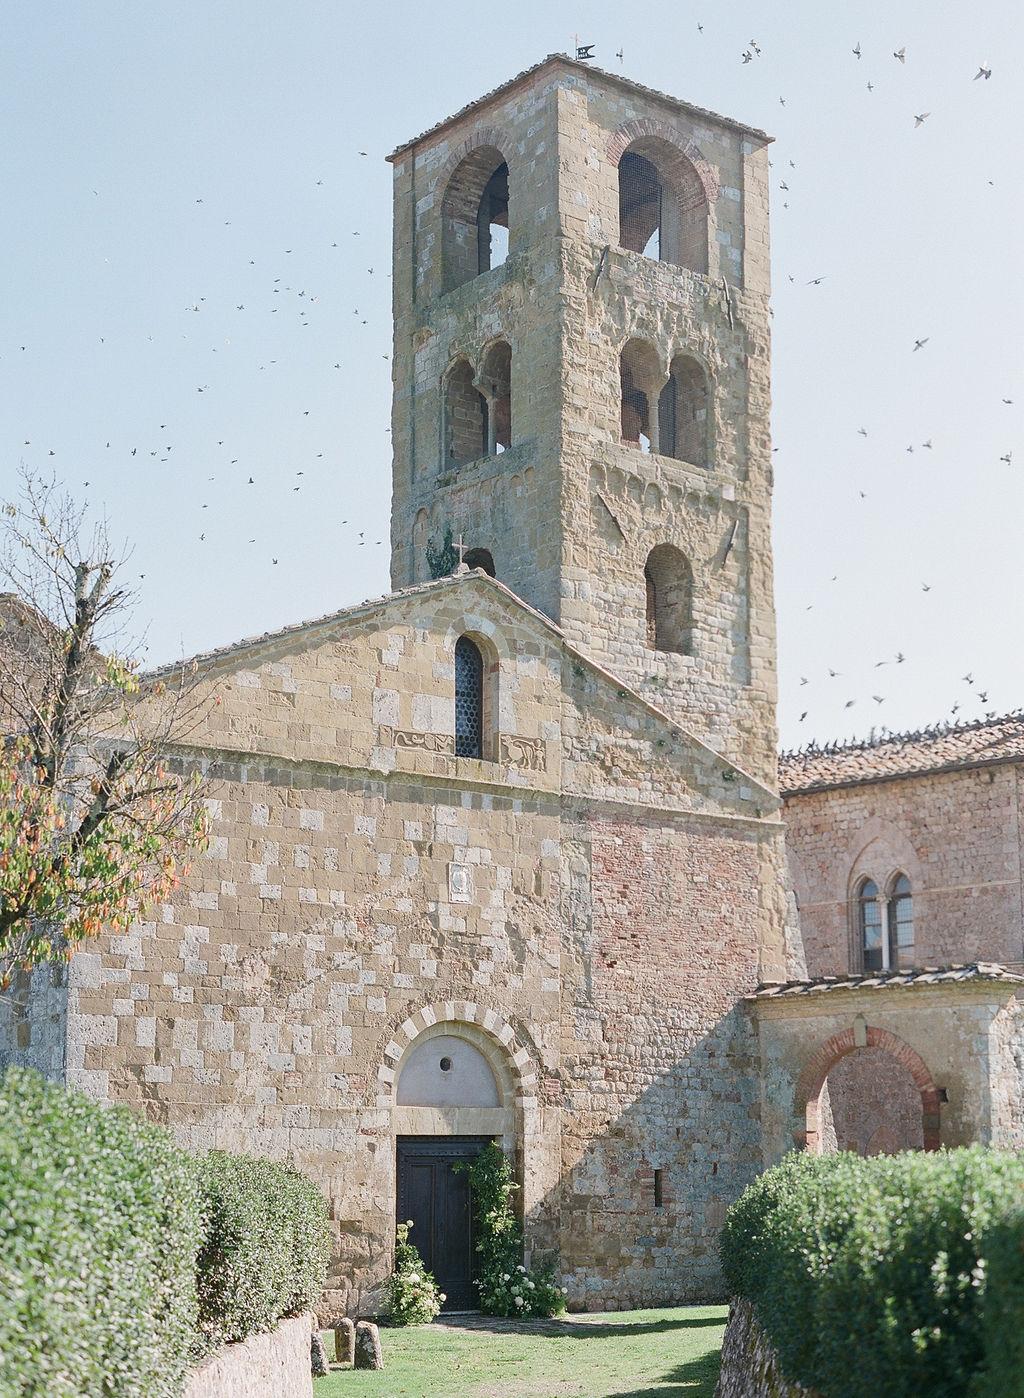 birds flying above chiesa di san giovanni battista